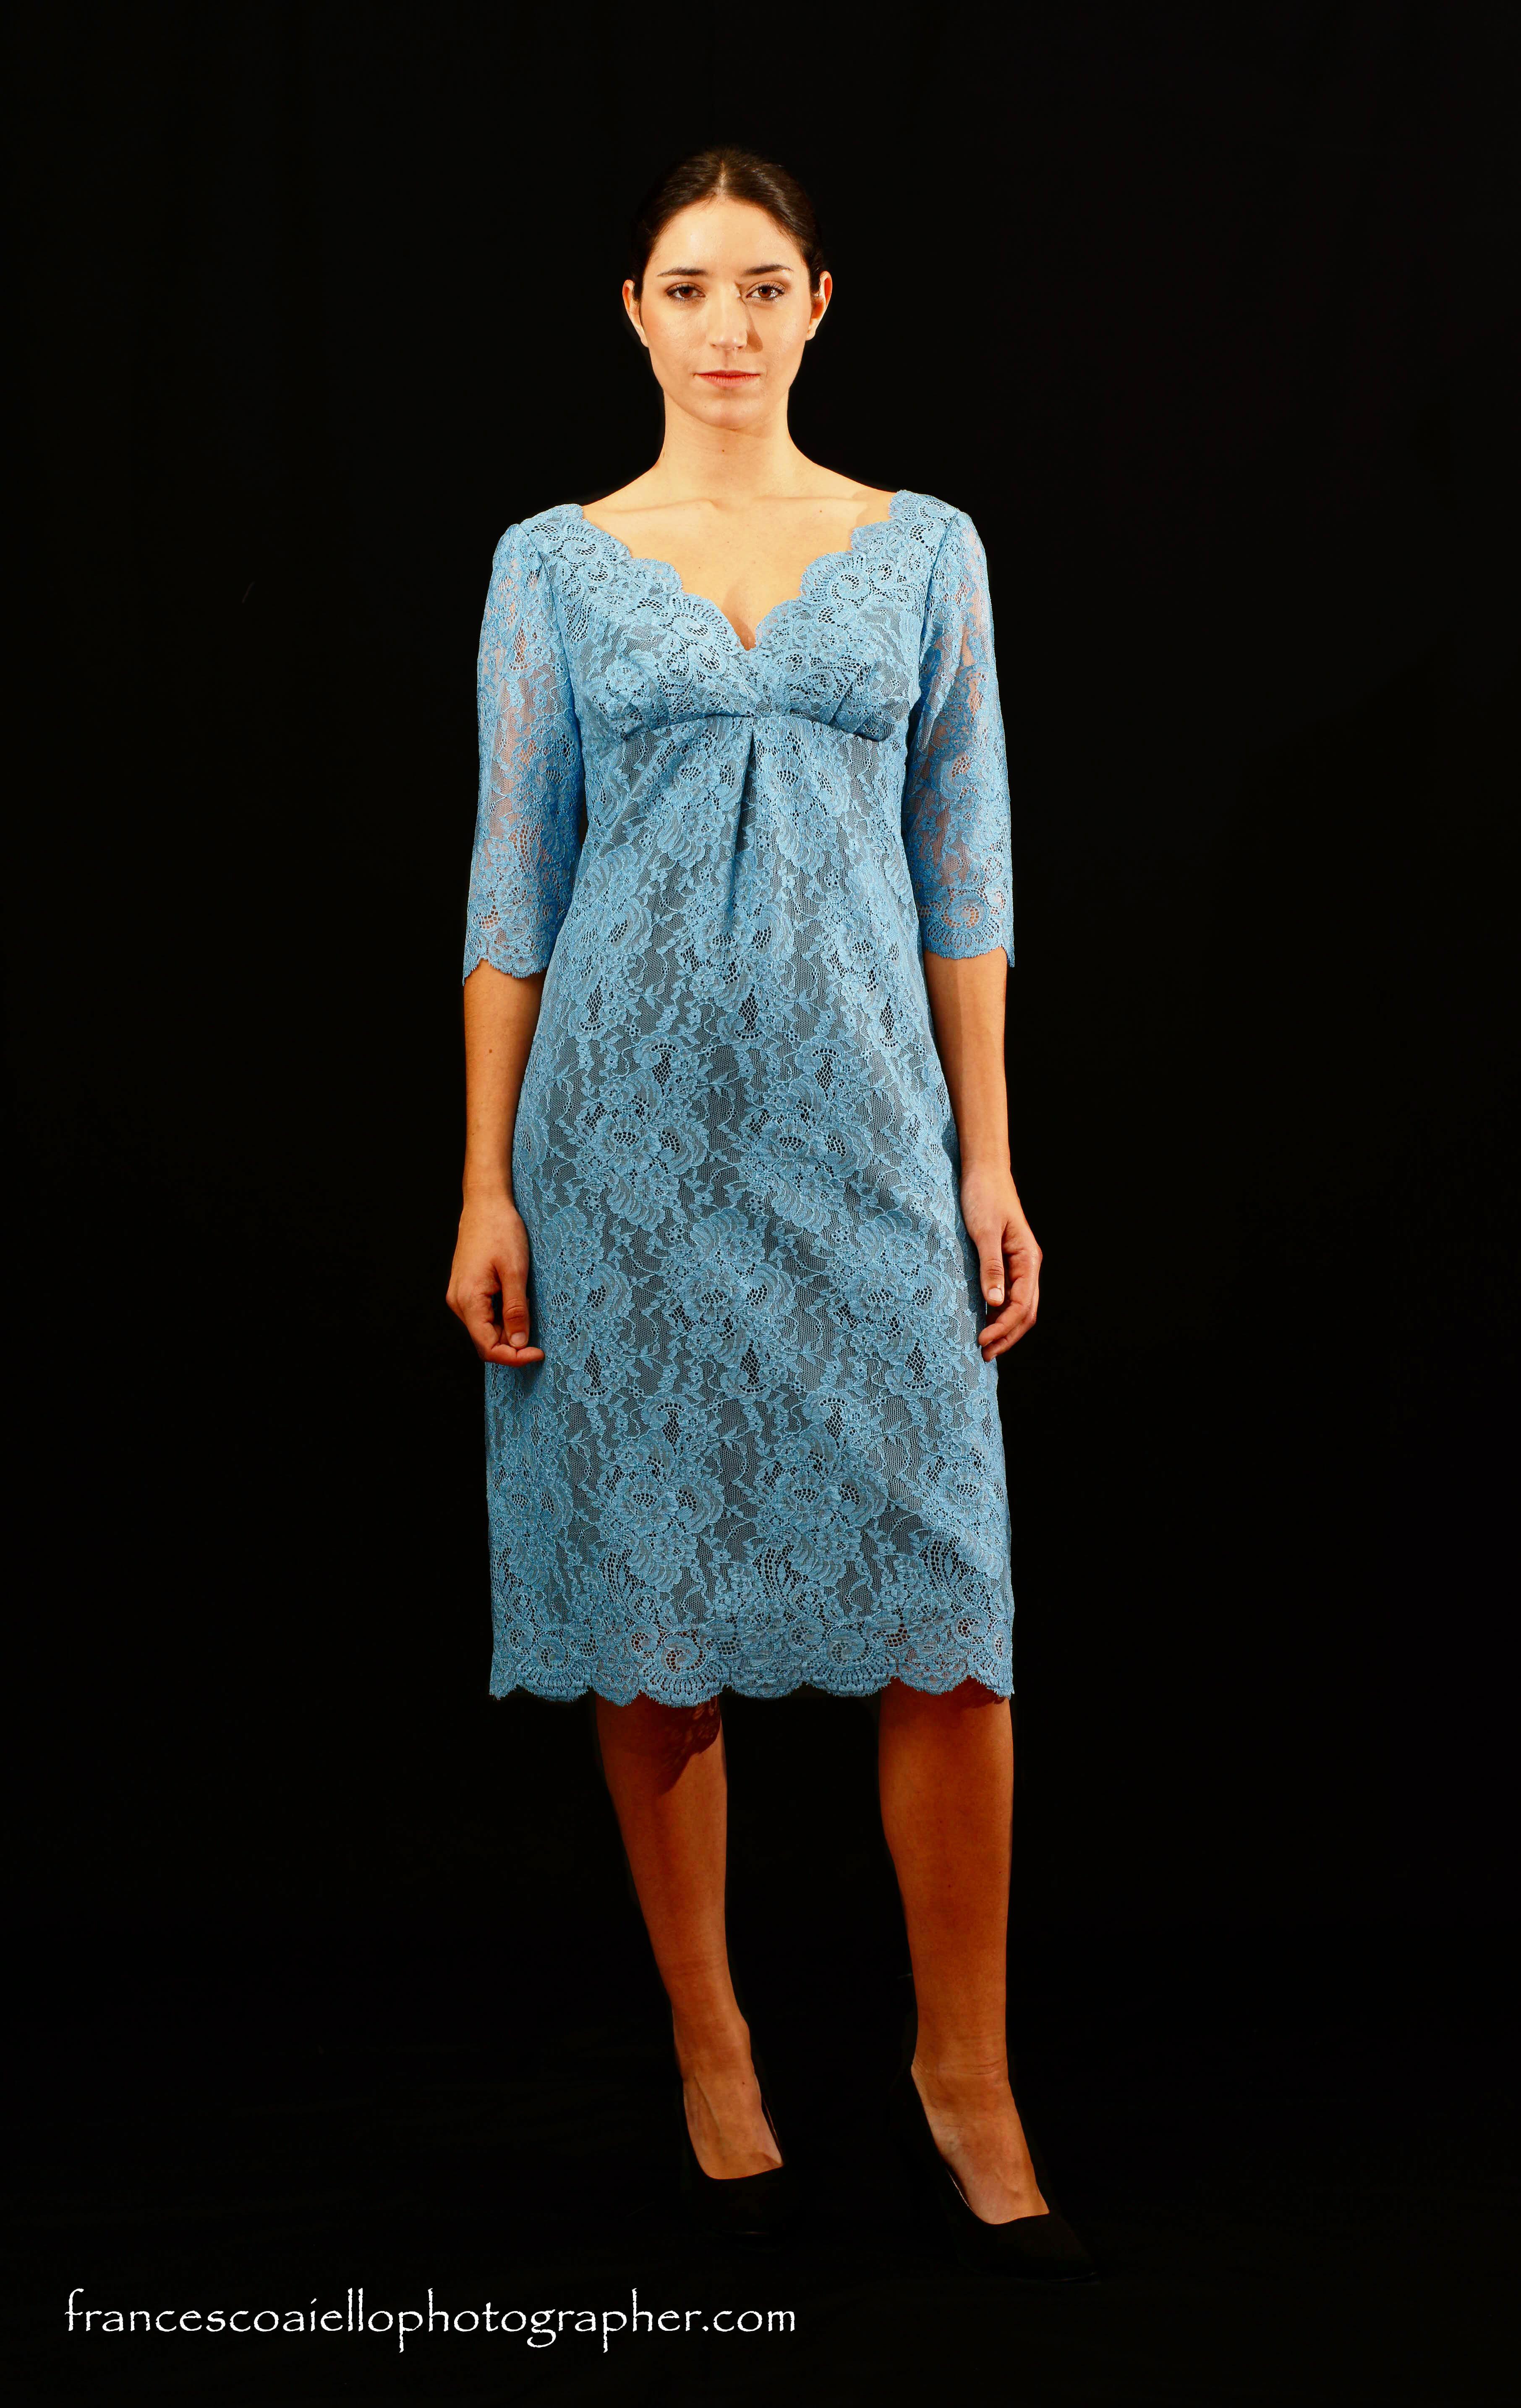 Vestido Manga Vestido Azul Azul Francesa wXUq515z